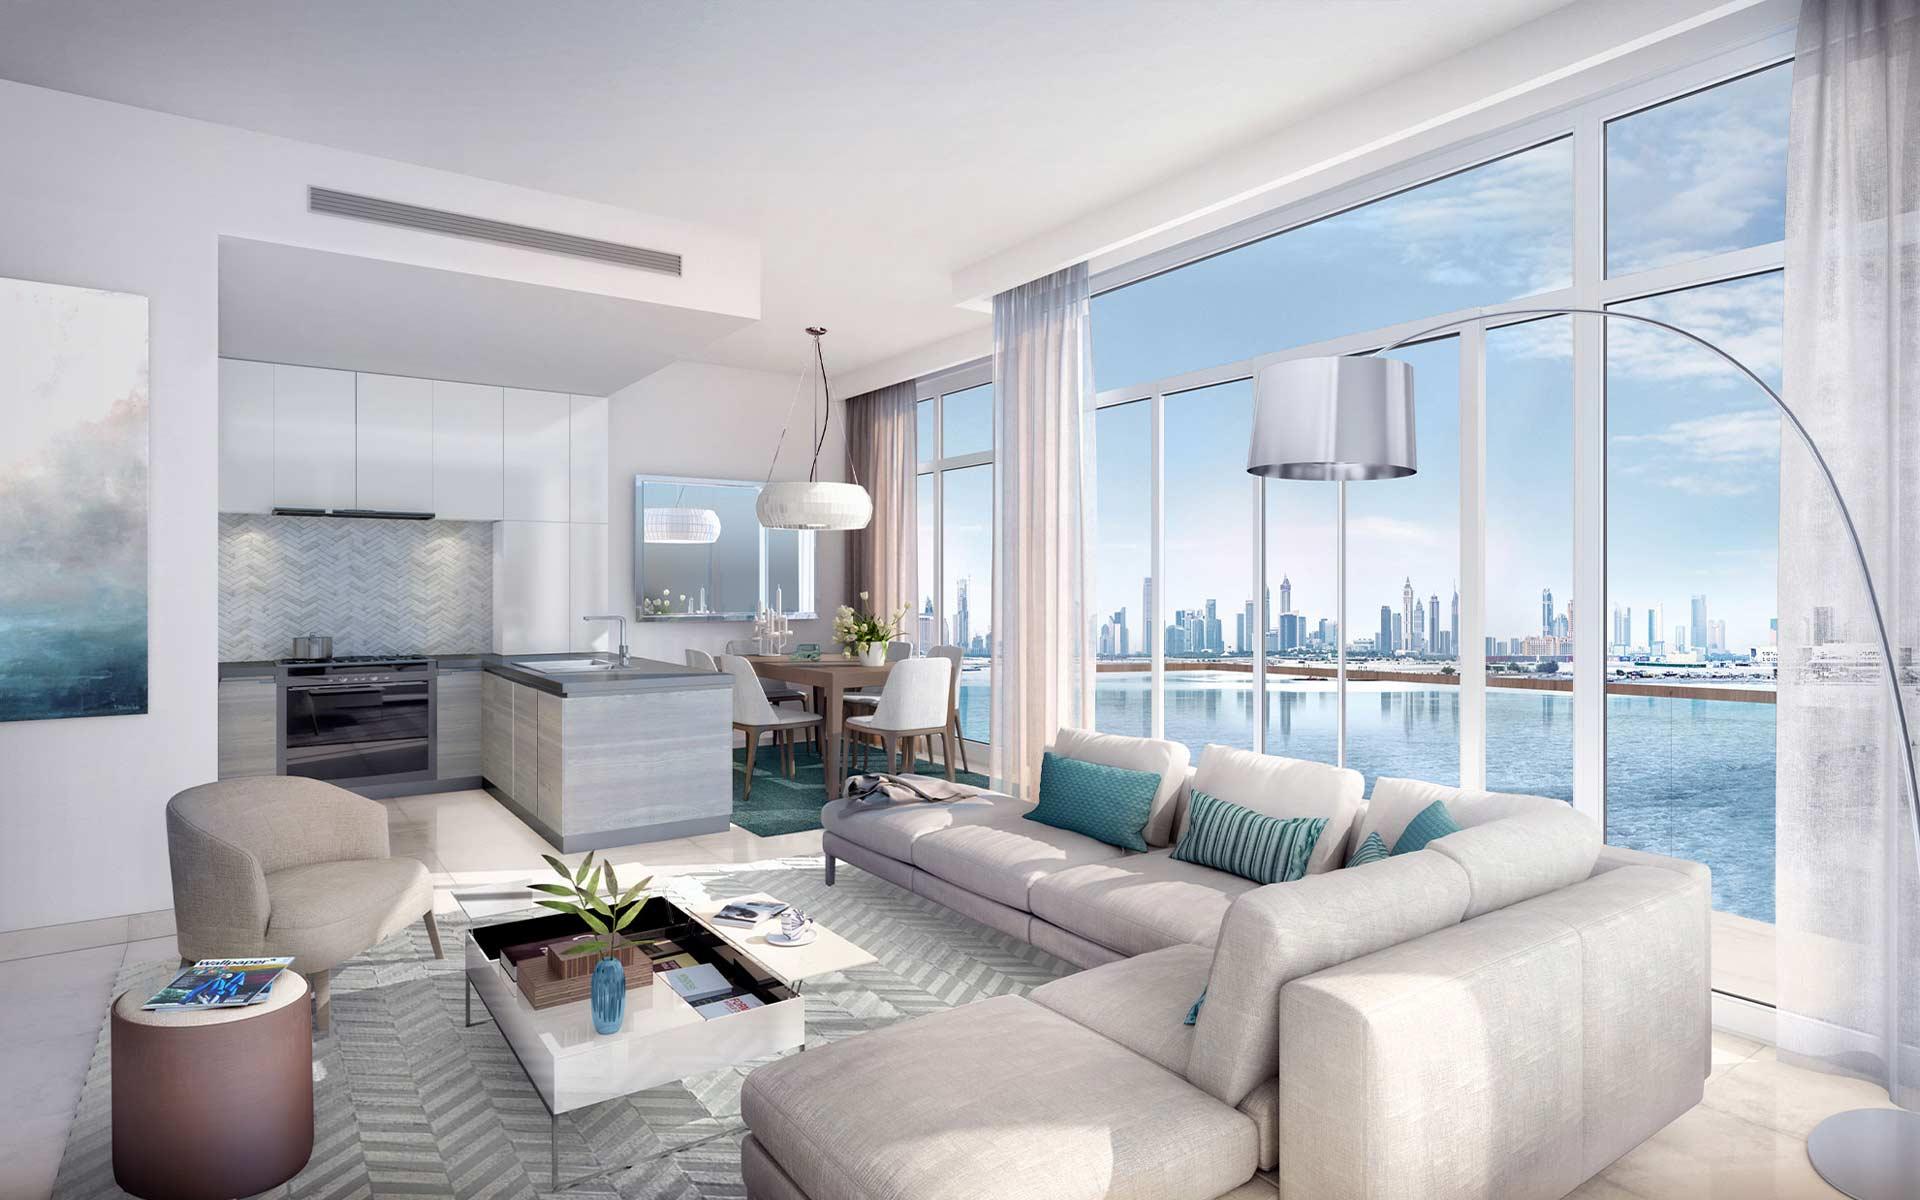 3-bedroom-high-floor-unit-in-the-cove